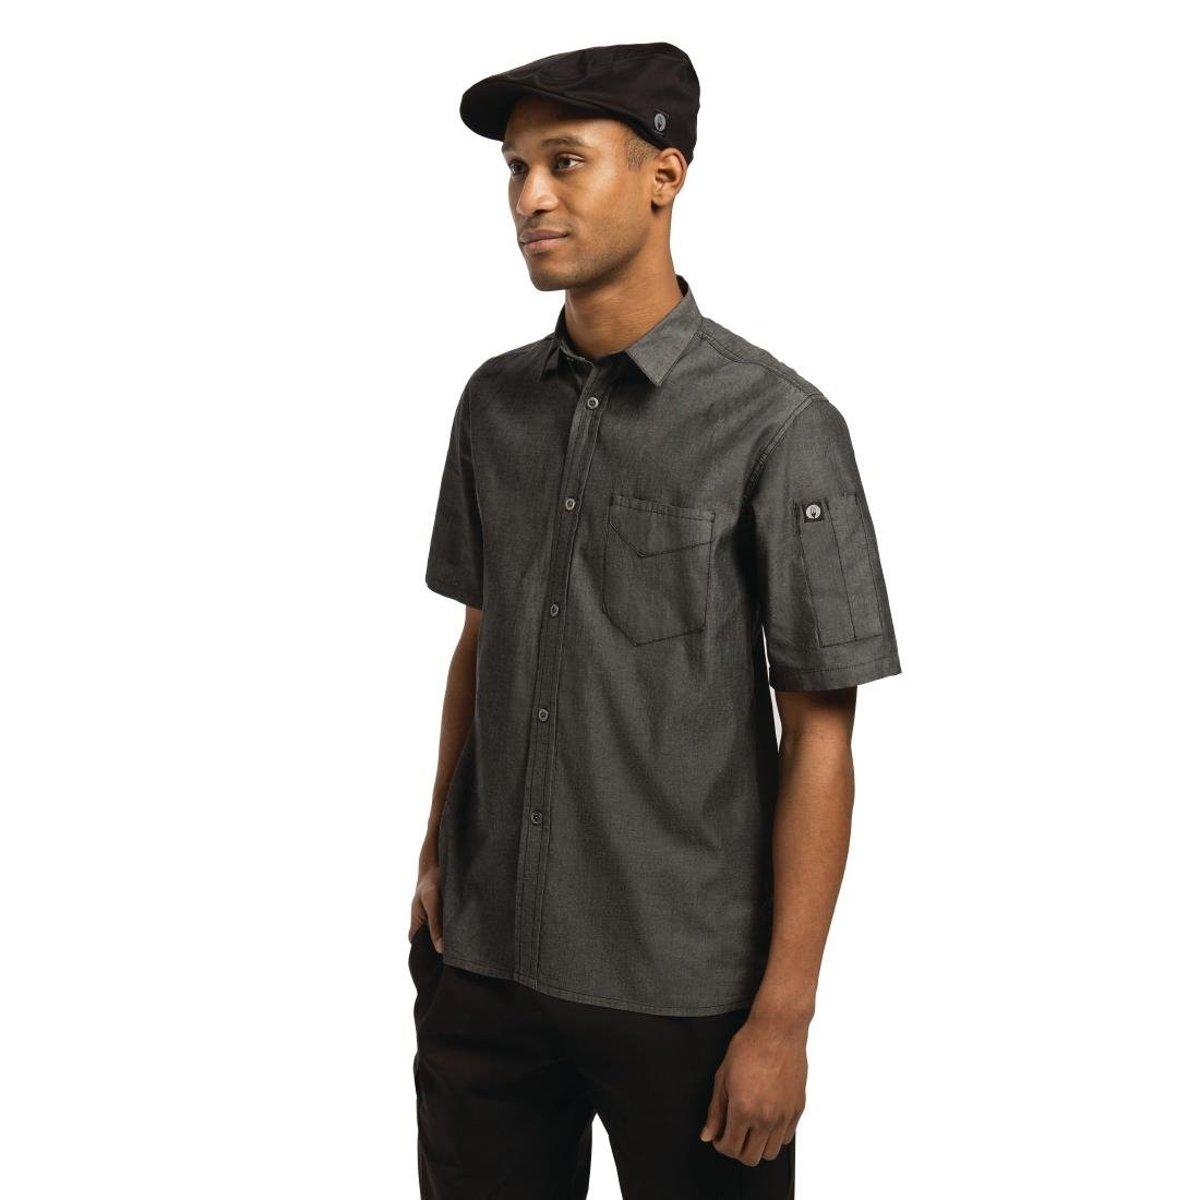 Unisex Detroit Zwart denim shirts (S) kopen